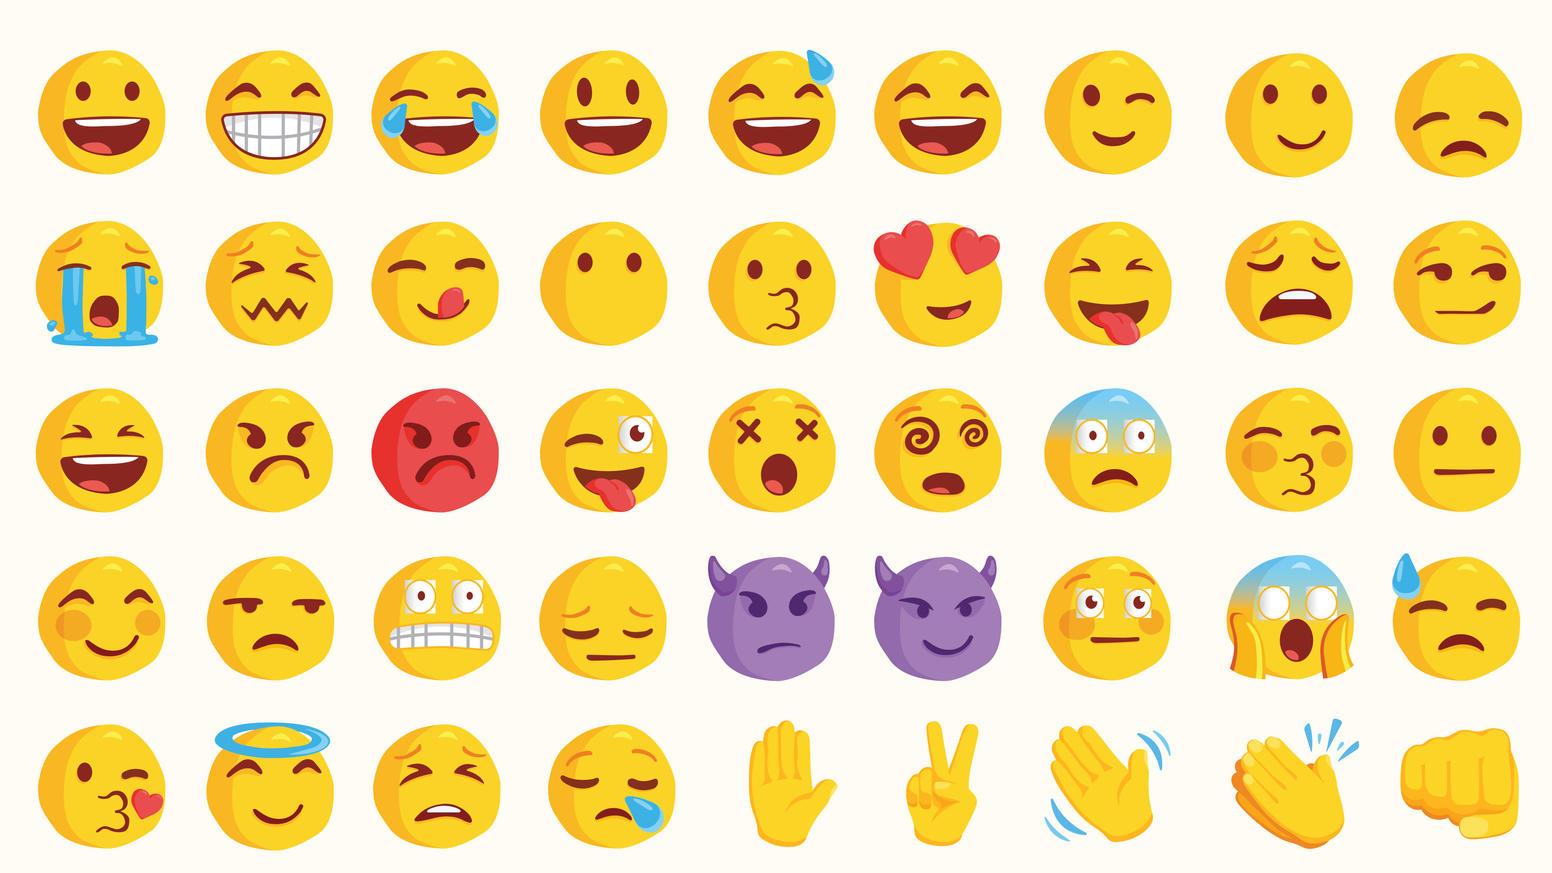 Whatsapp bedeutung smileys insuvingnim: Smiley